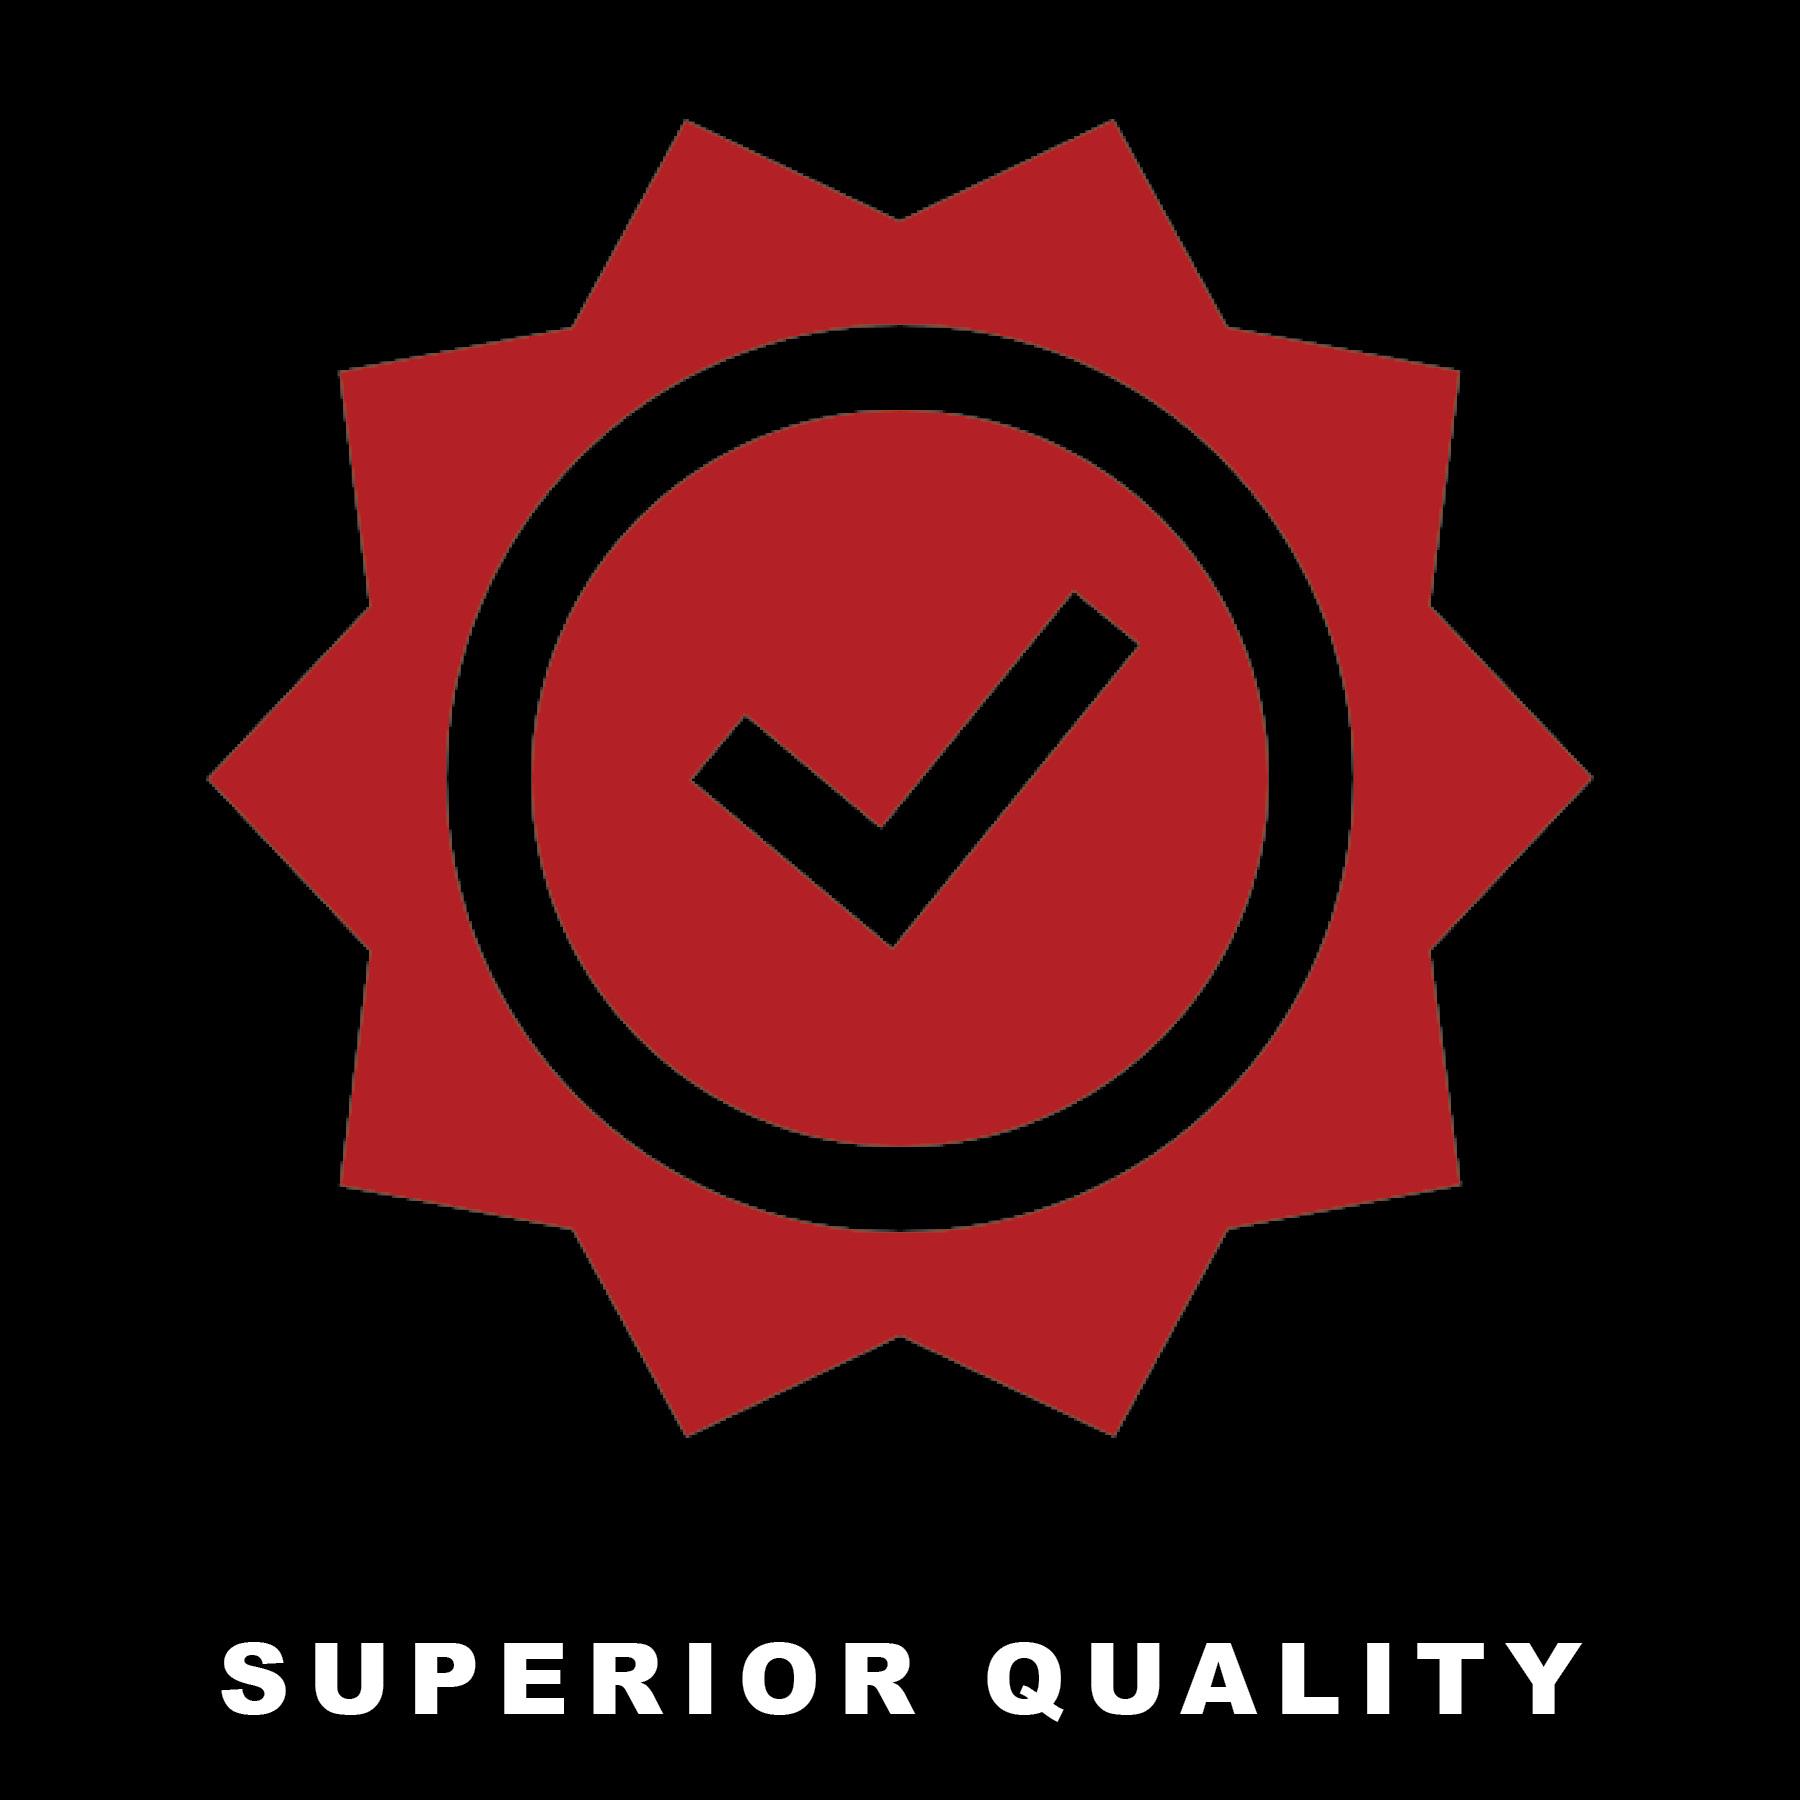 Superior Quality Symbol Black.jpg